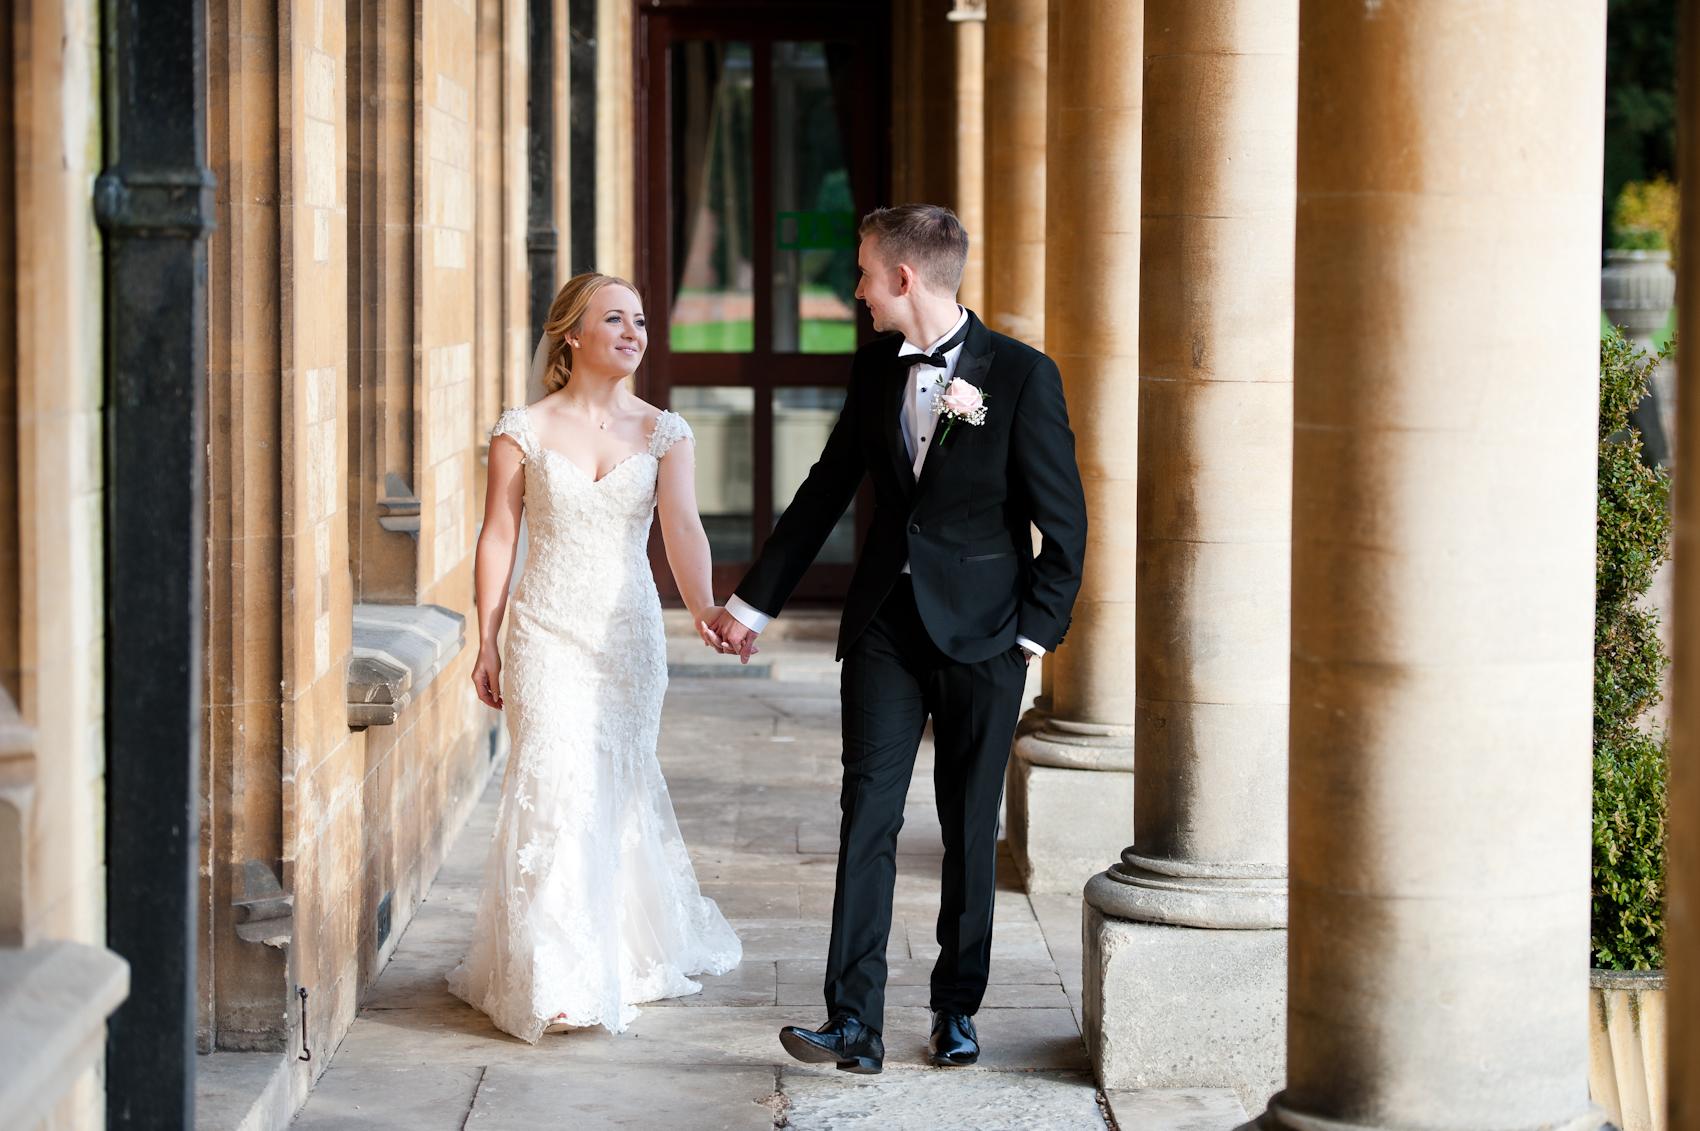 Declan & Emma wedding (13 of 29).jpg